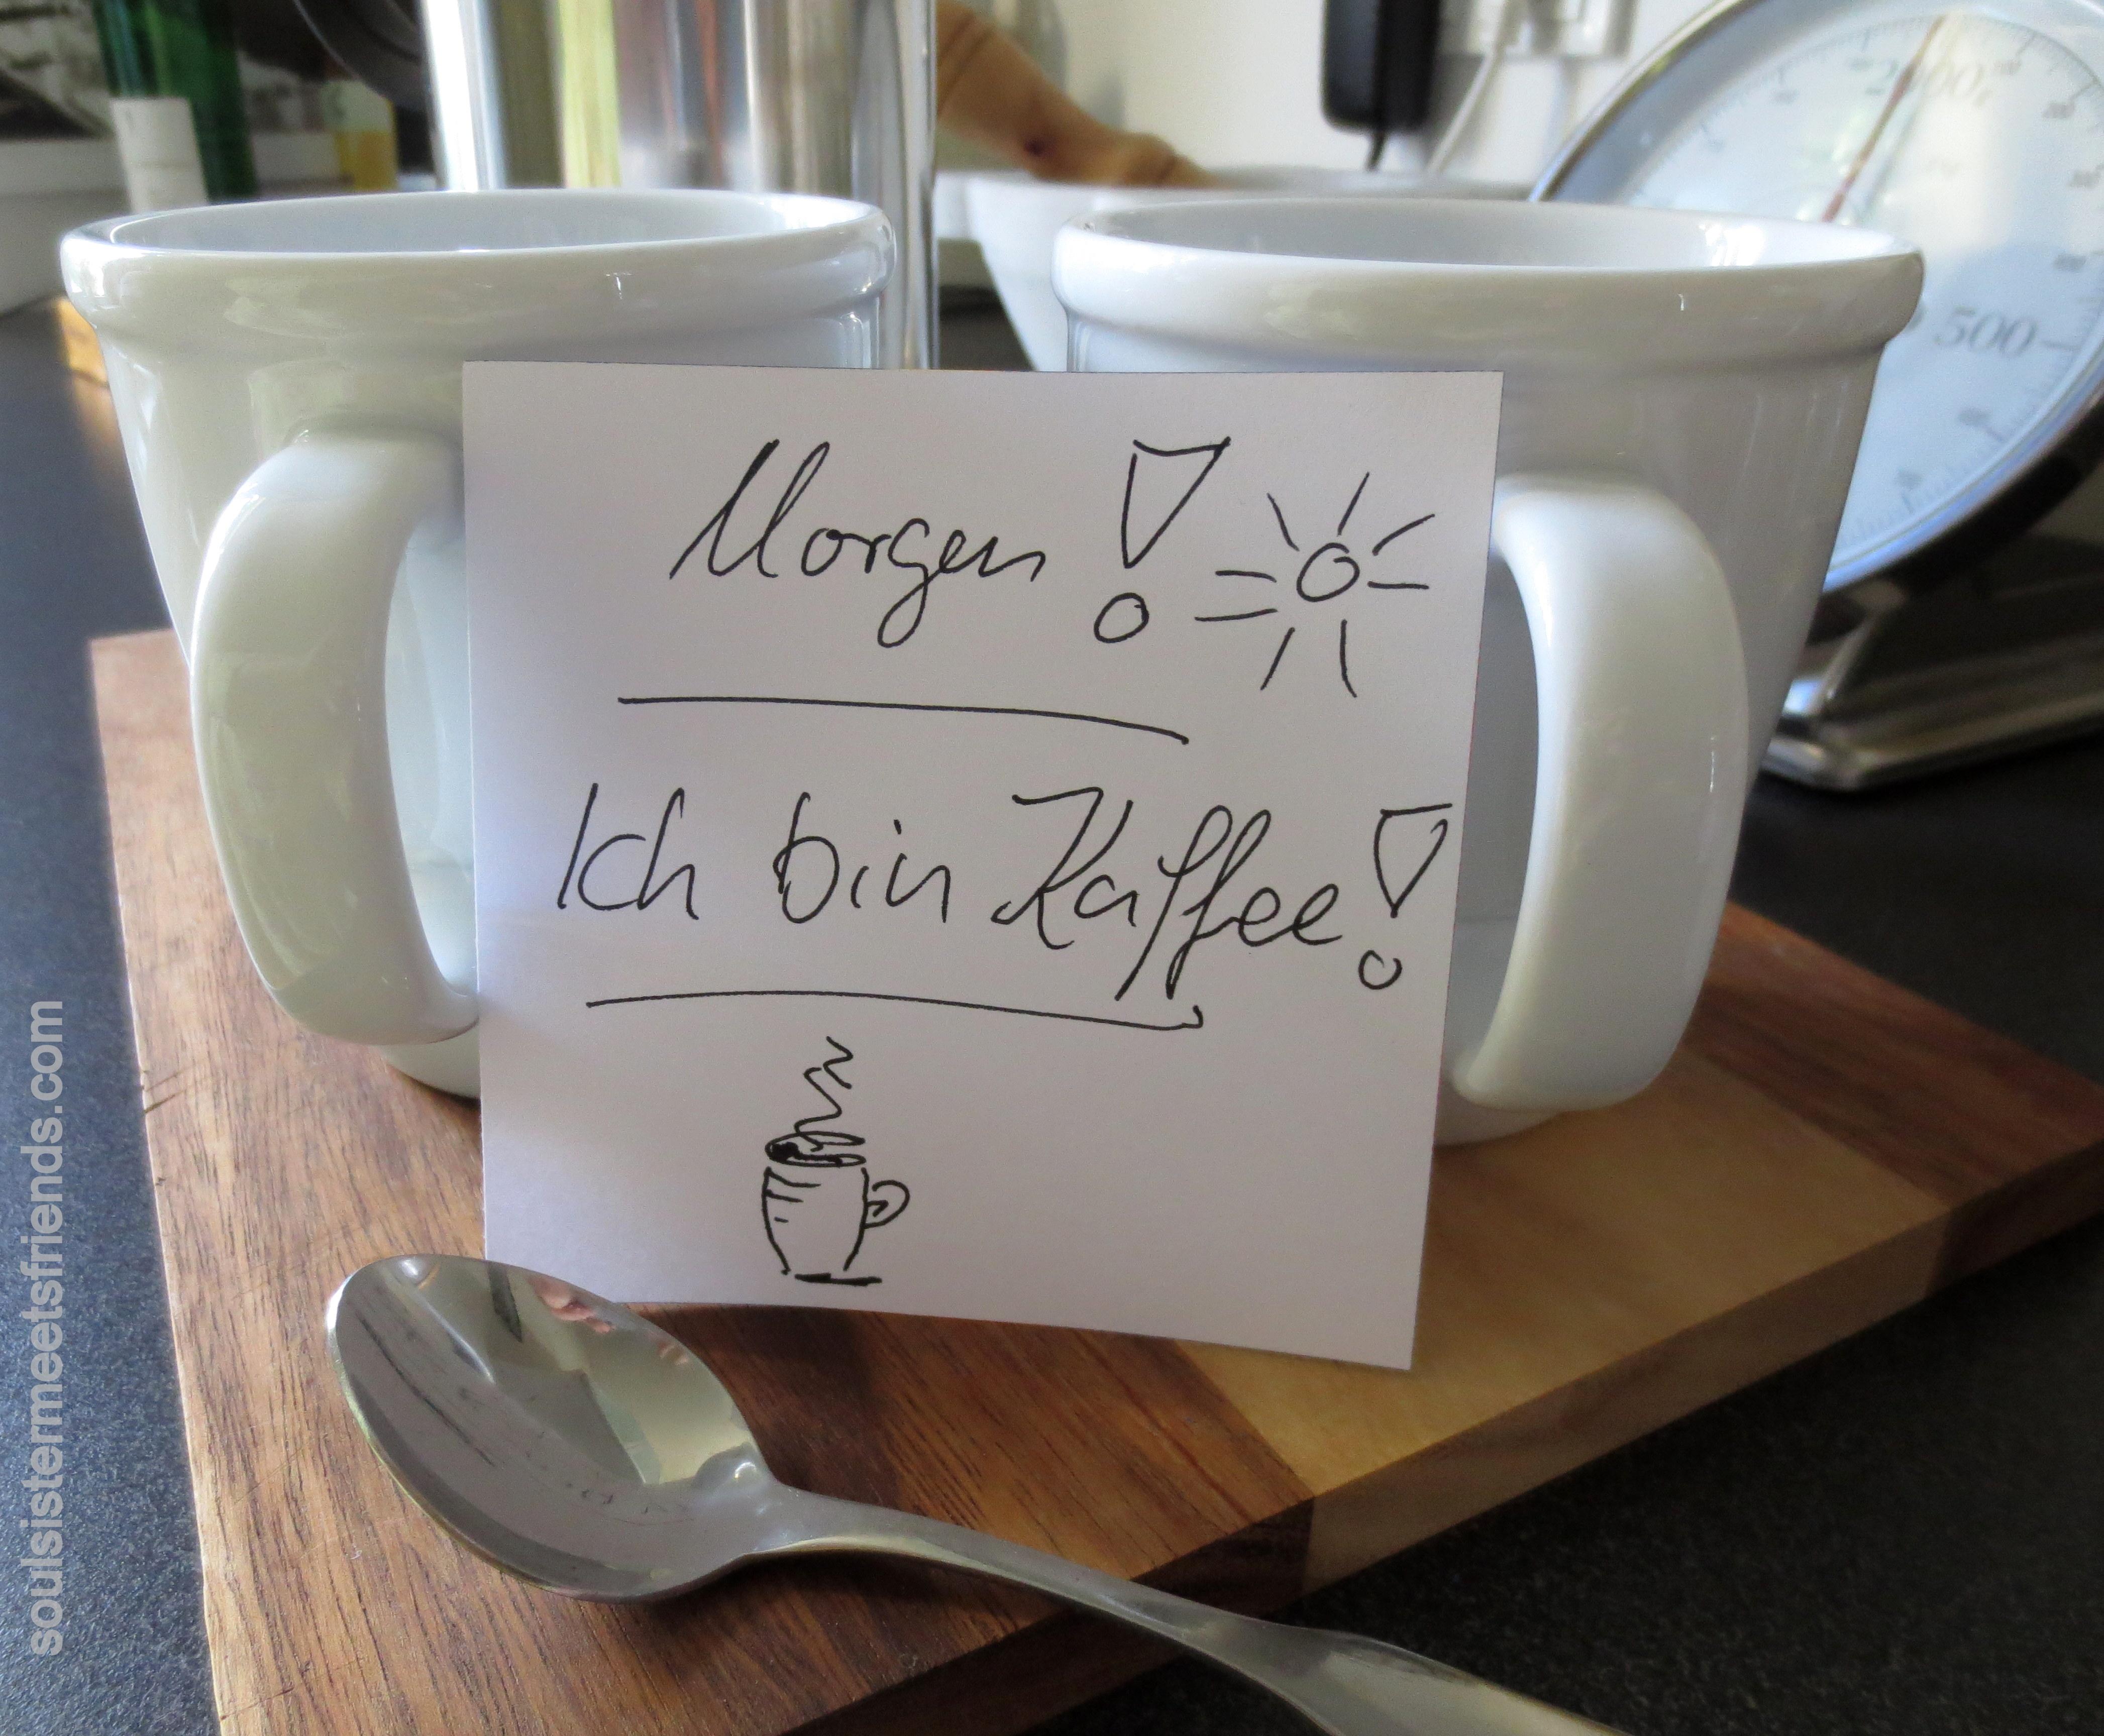 Ich bin Kaffee